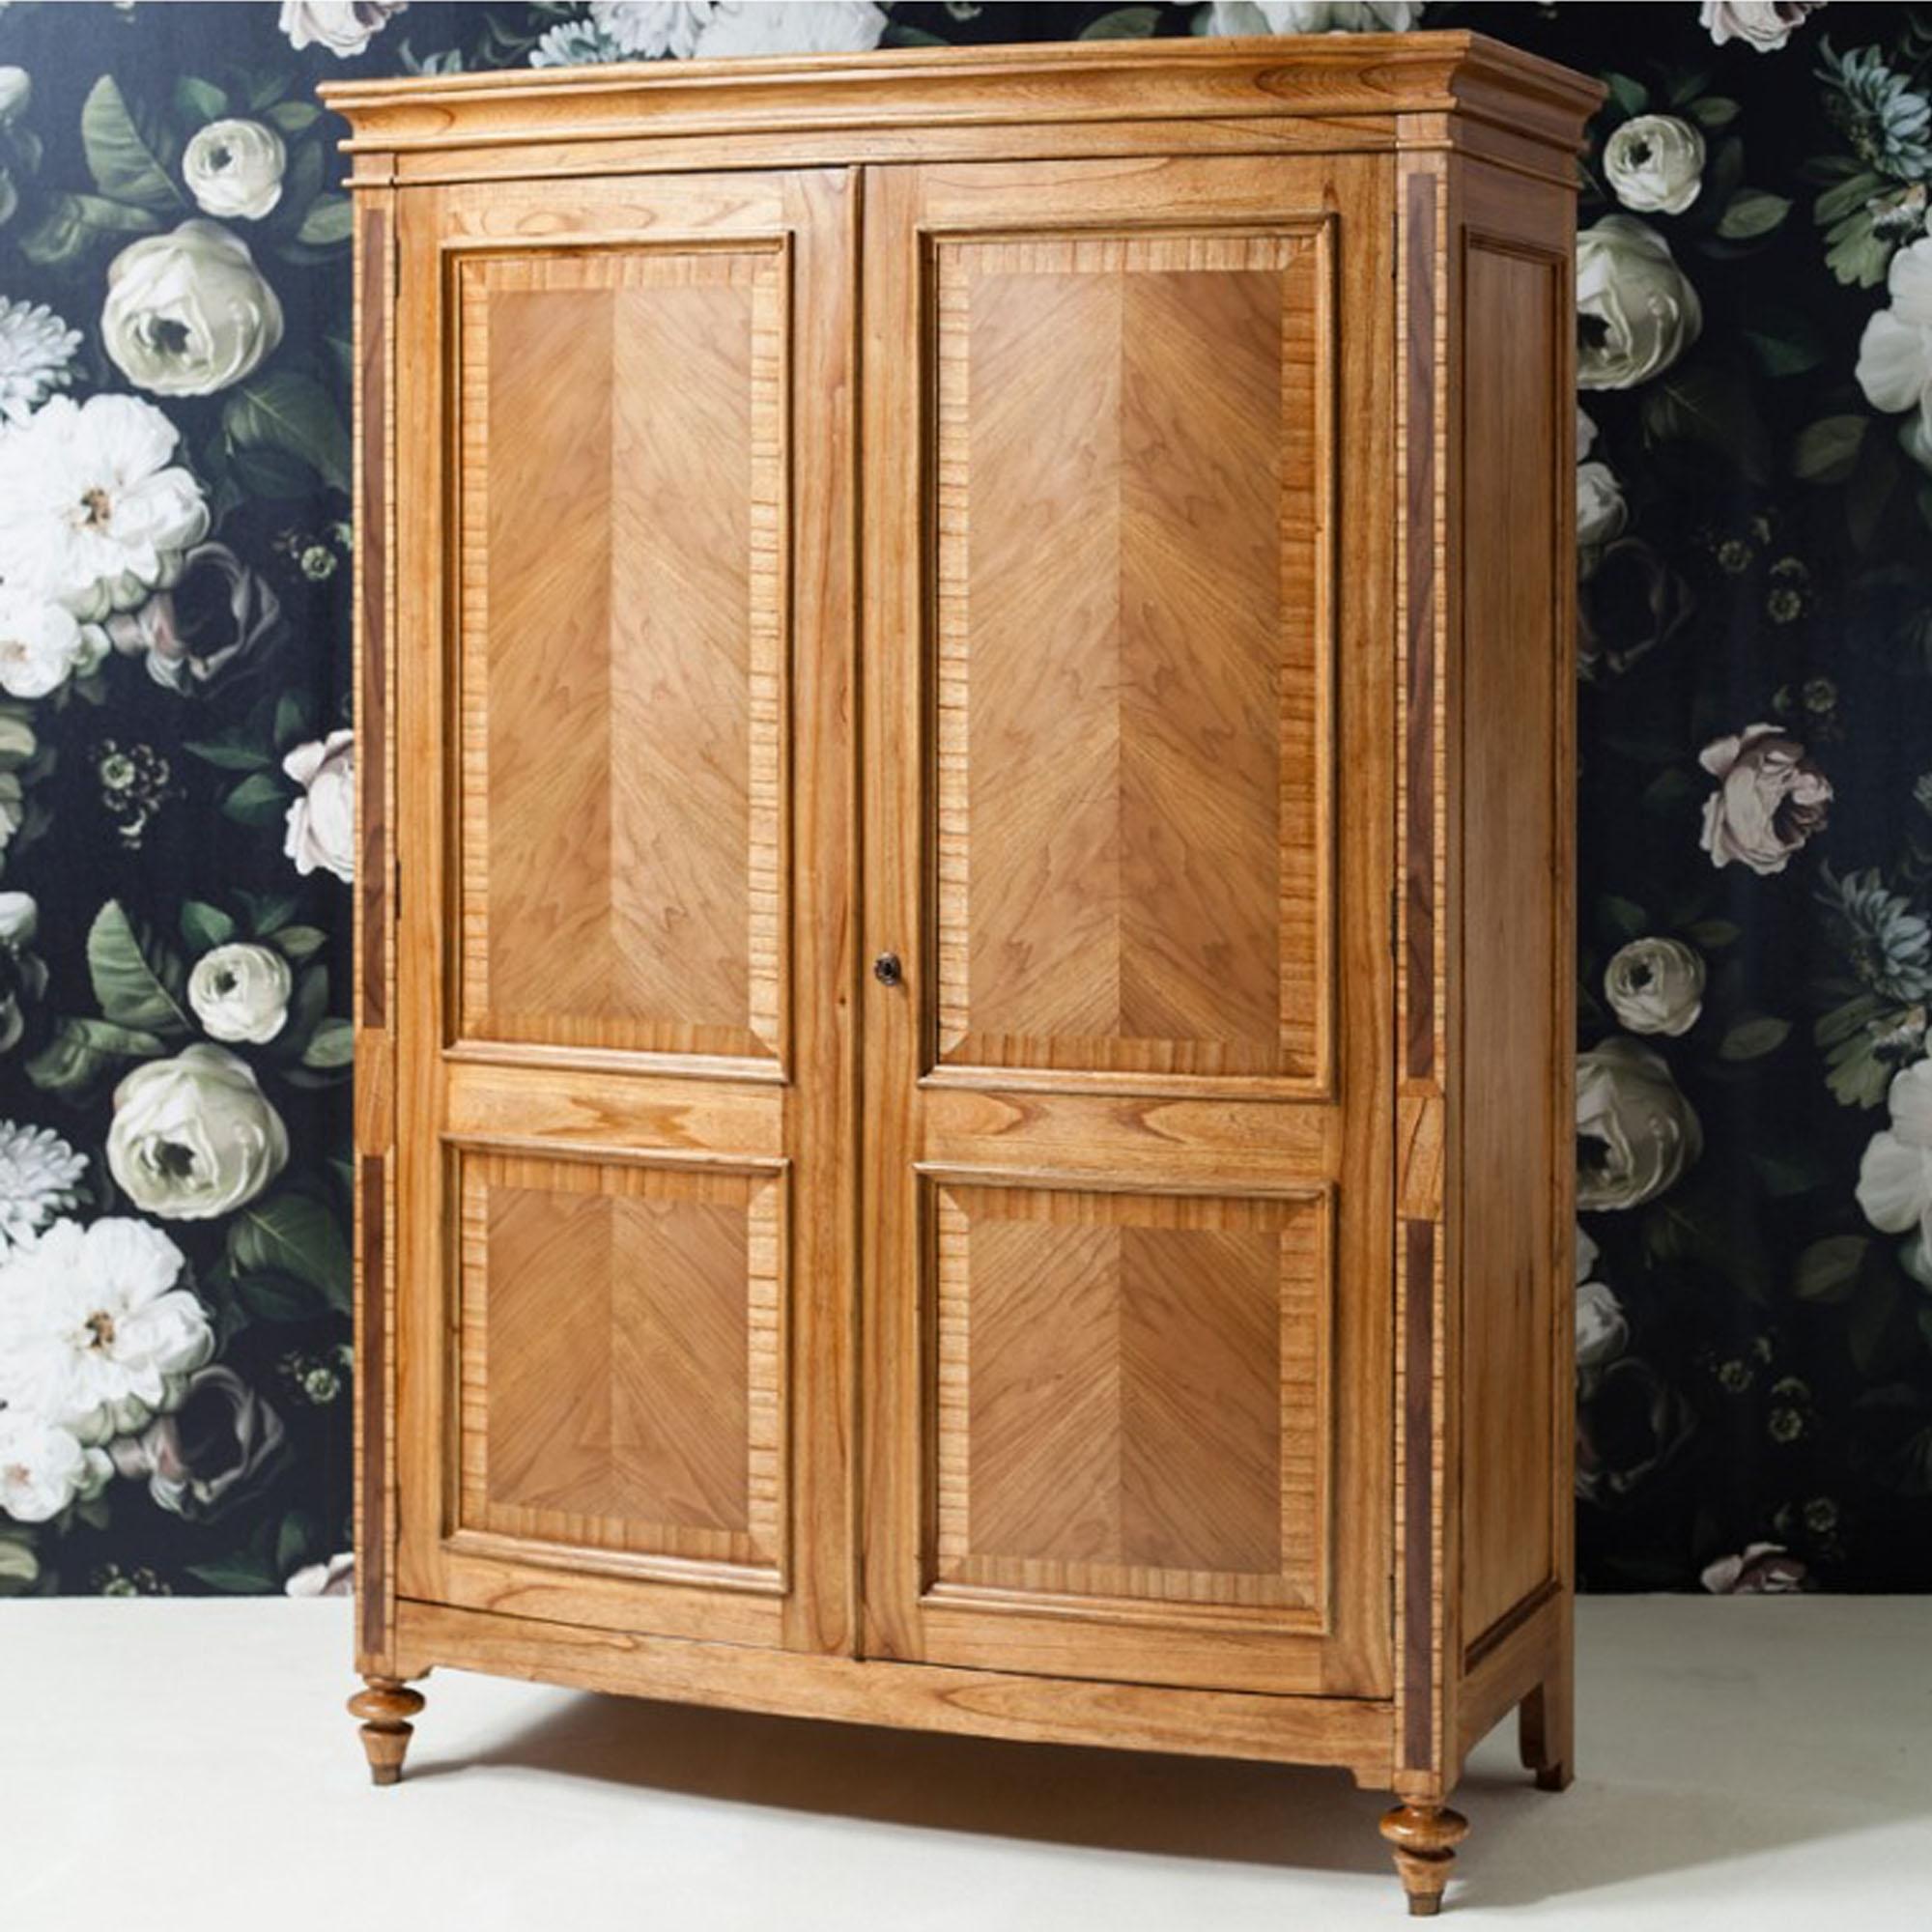 Spire 2 Door Wooden Wardrobe Wooden Wardrobe Wooden Furniture